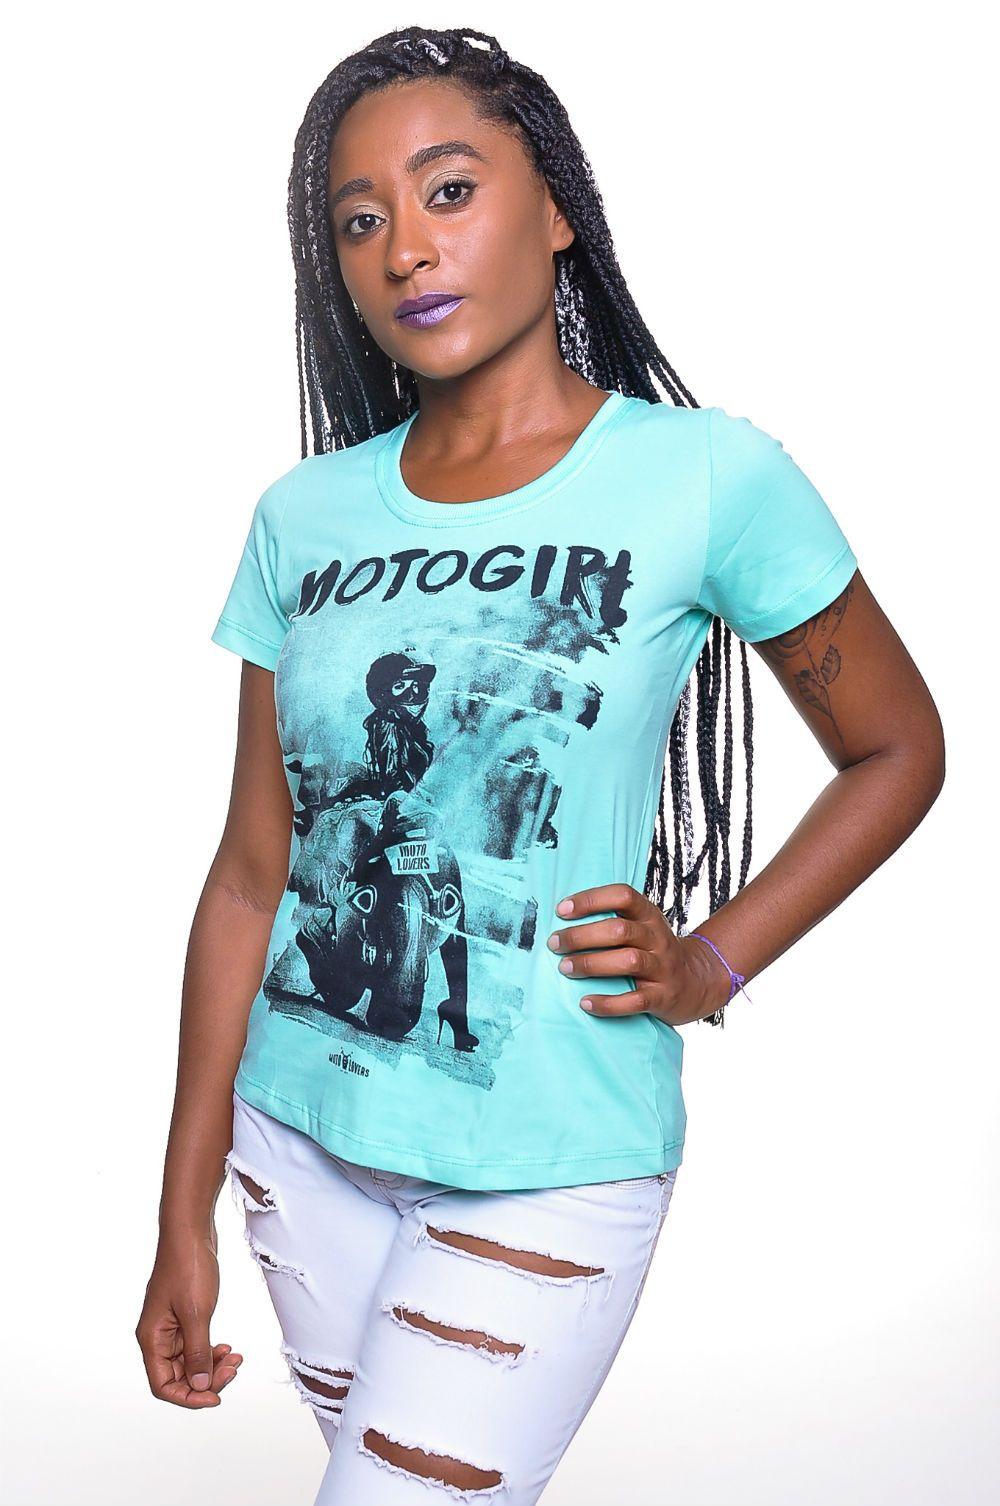 Camiseta Moto Lovers - Moto Girl